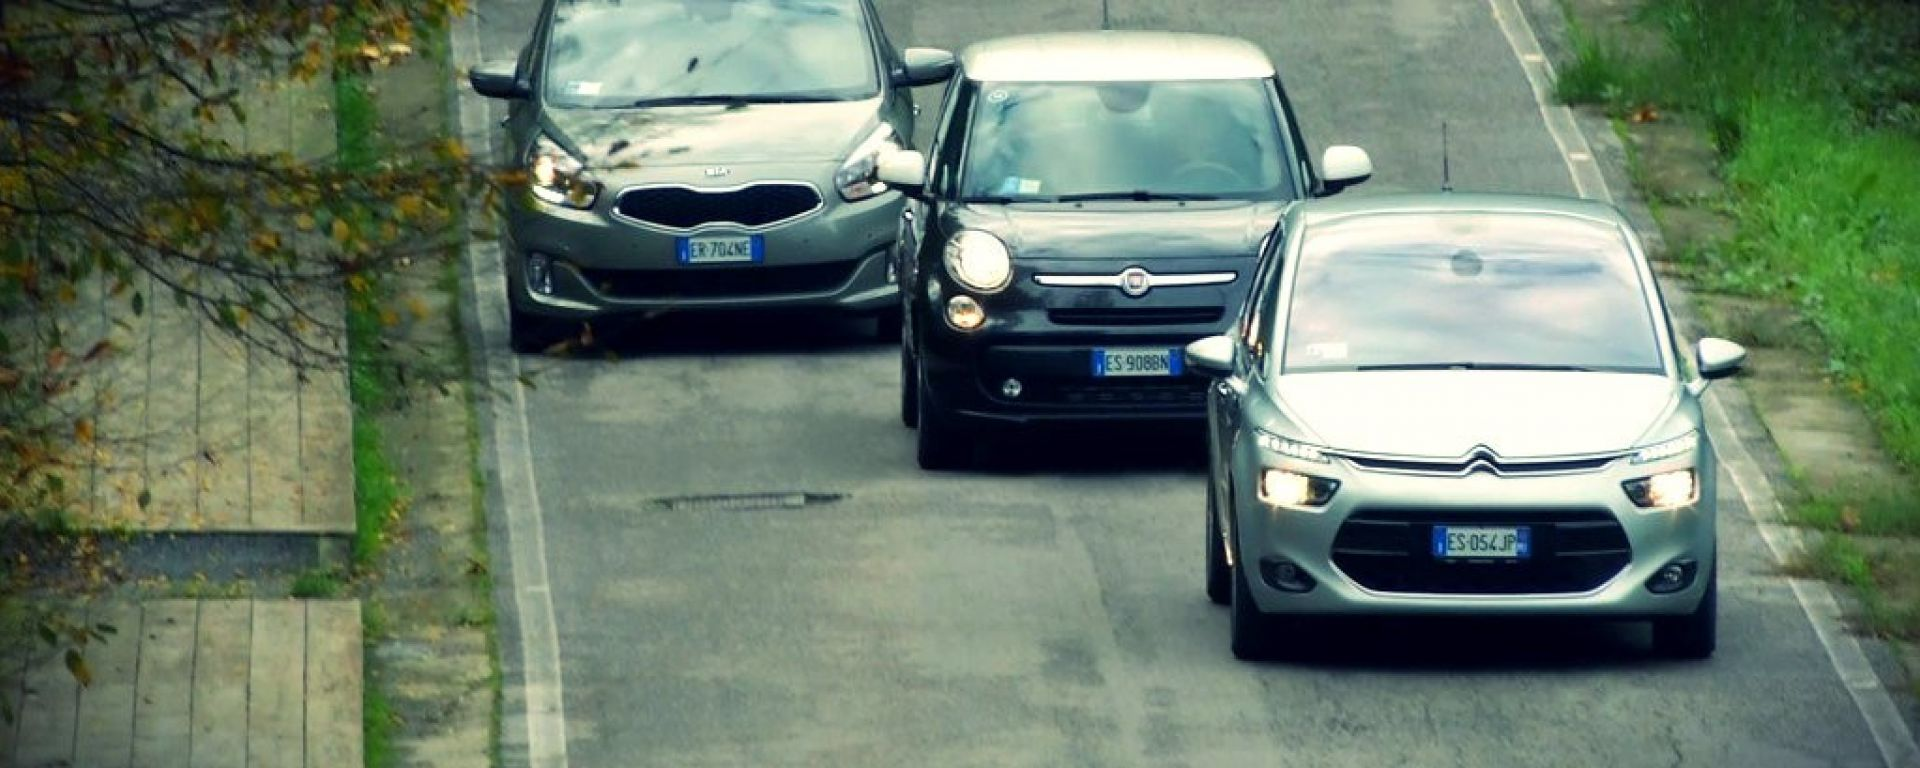 Citroën C4 Picasso vs  Fiat 500L Living vs Kia Carens